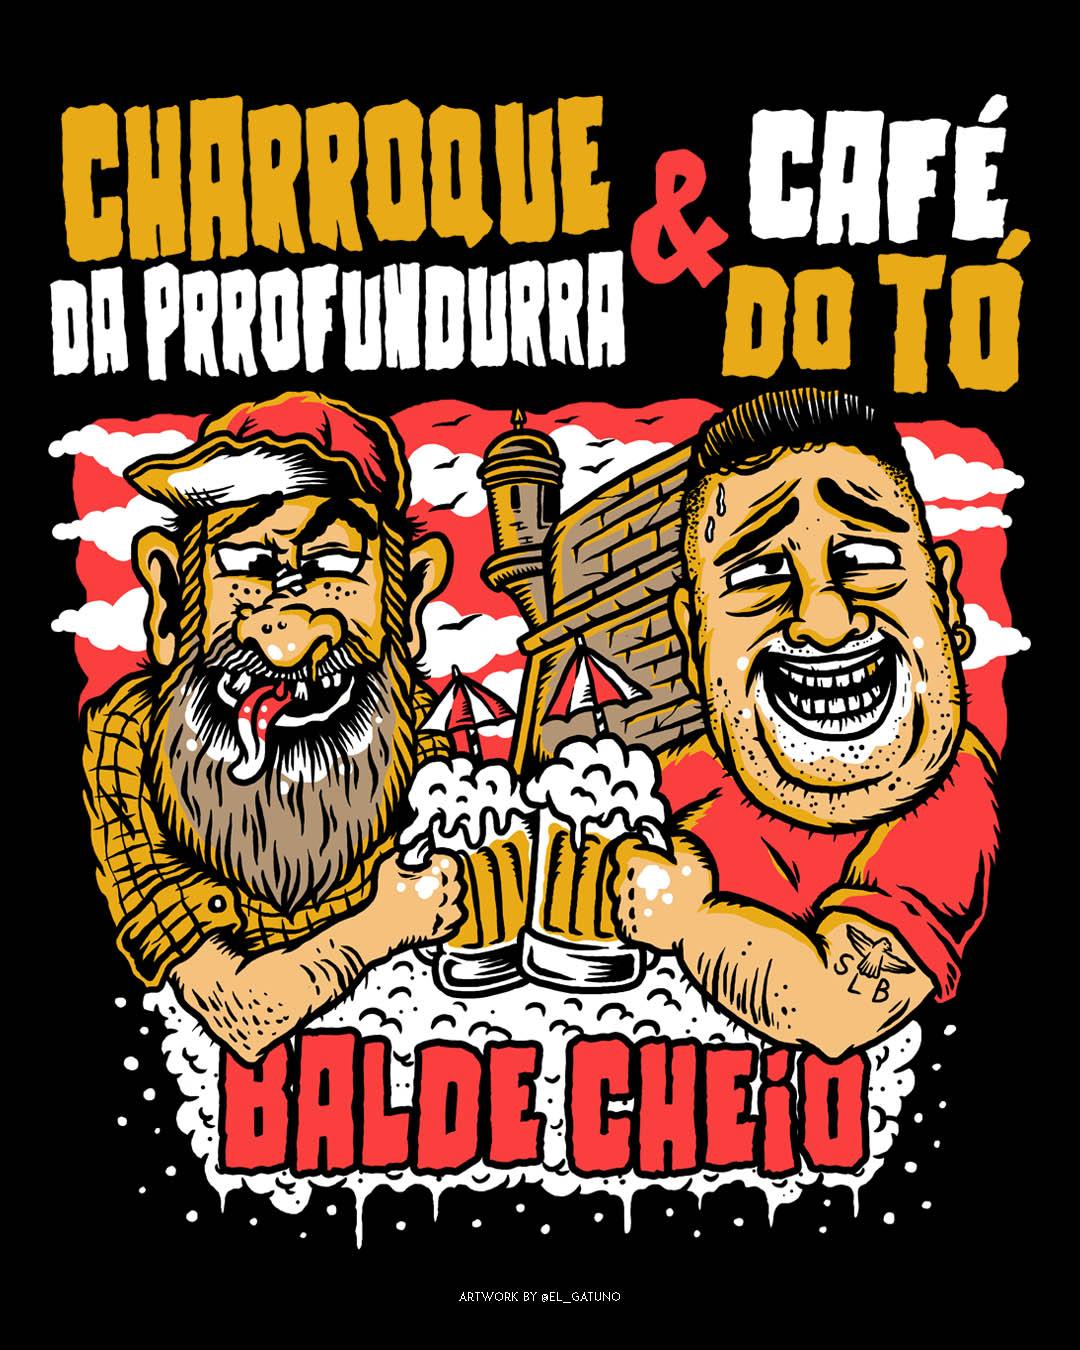 Café do Tó